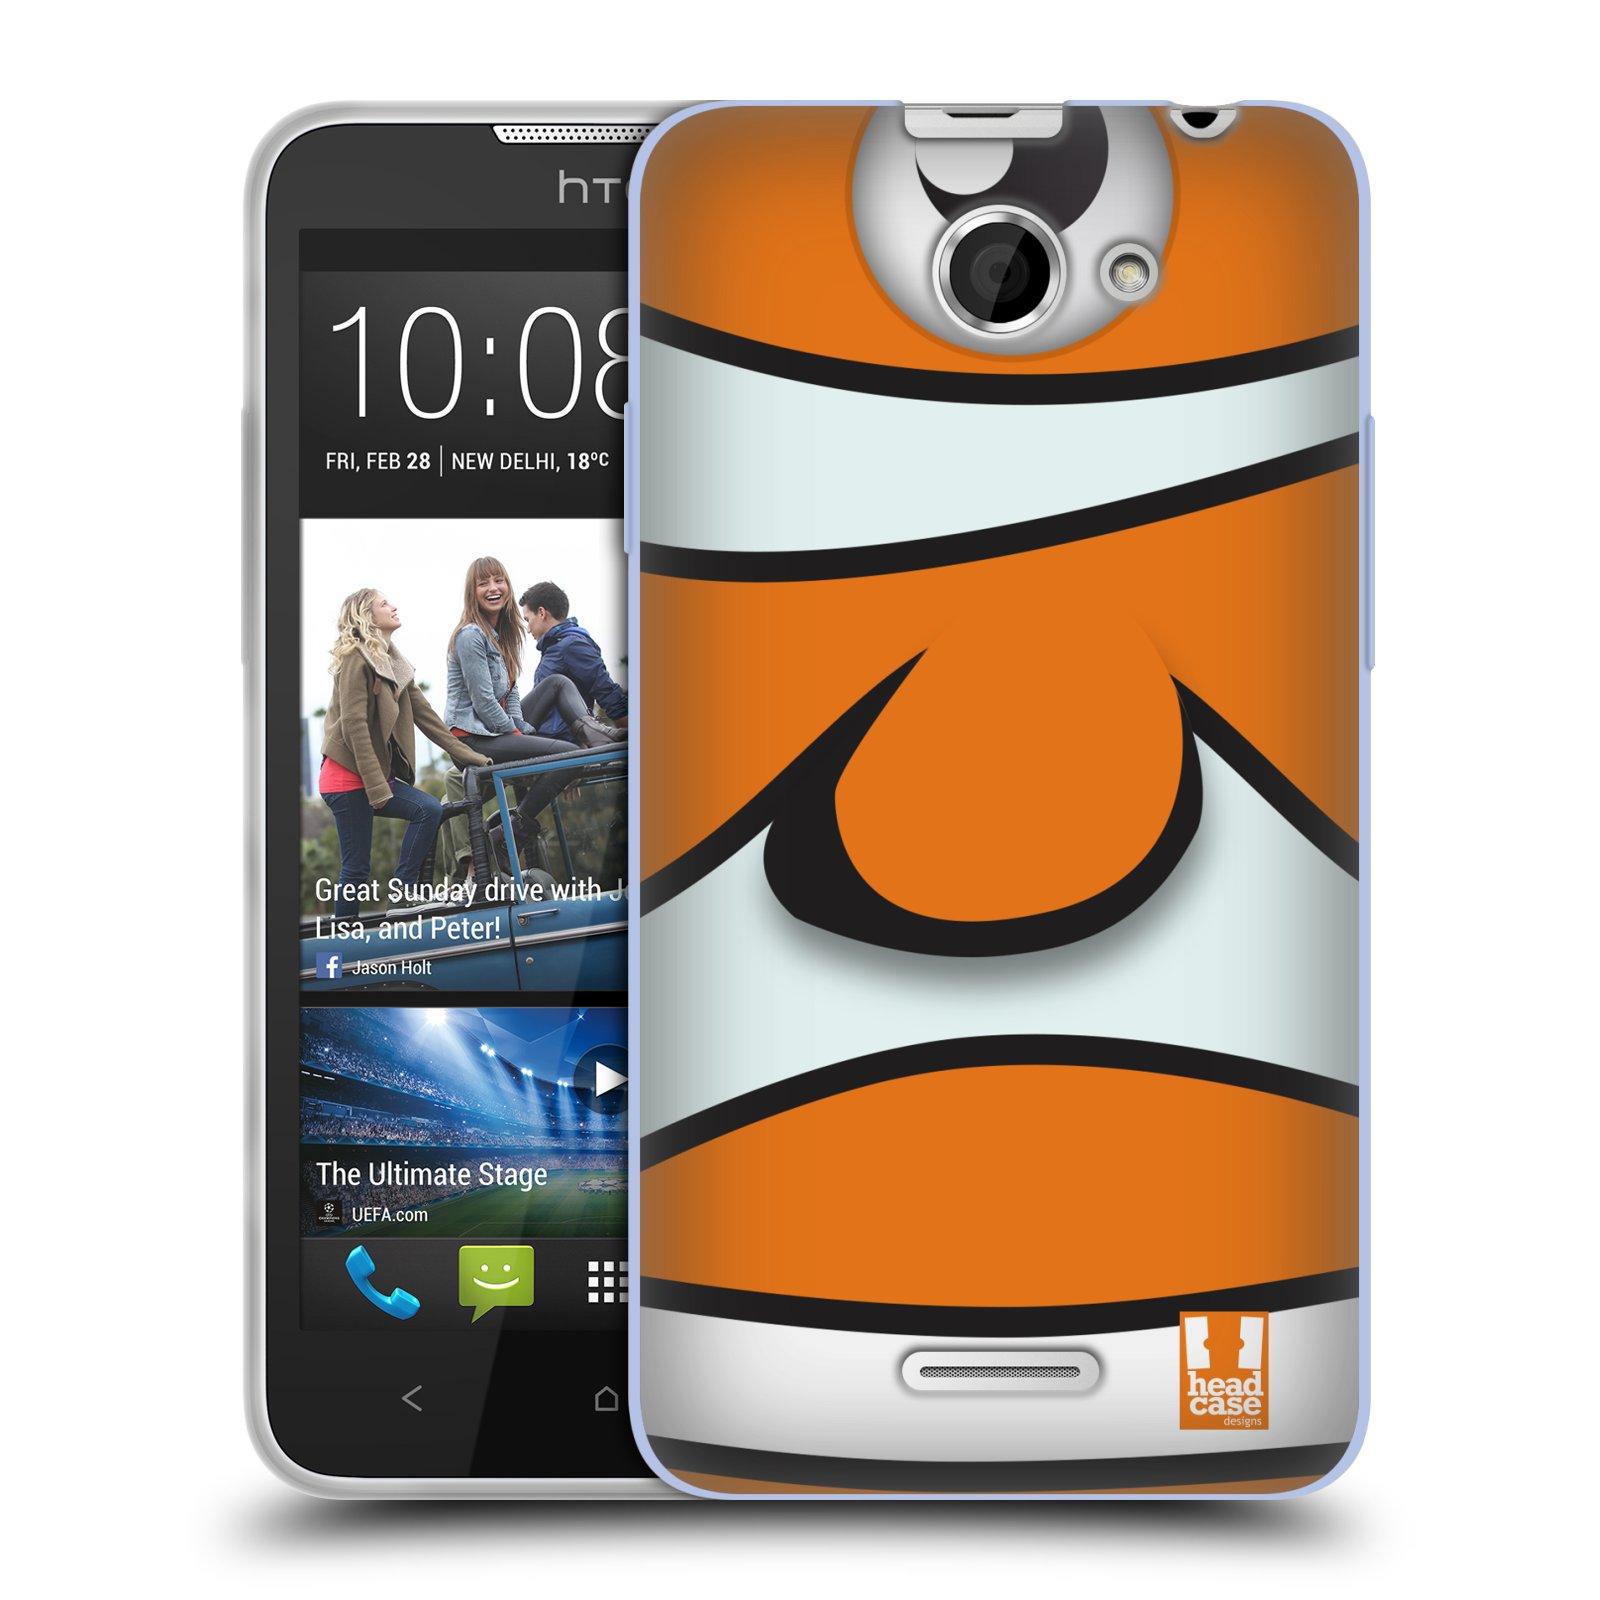 HEAD CASE silikonový obal na mobil HTC DESIRE 516 vzor Rybičky z profilu klaun oranžová NEMO